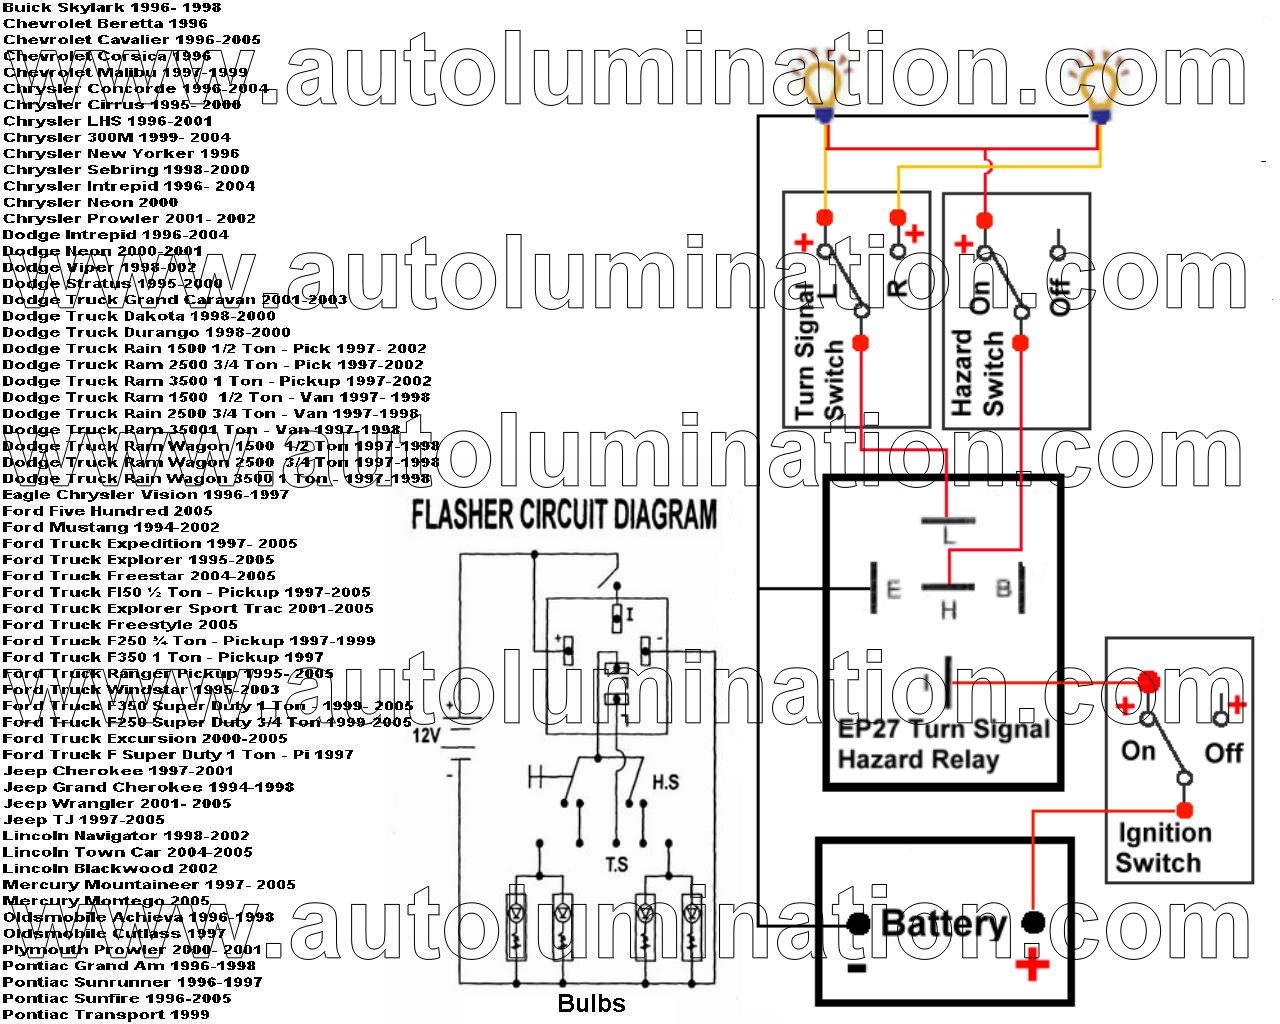 tridon el13 flasher wiring diagram